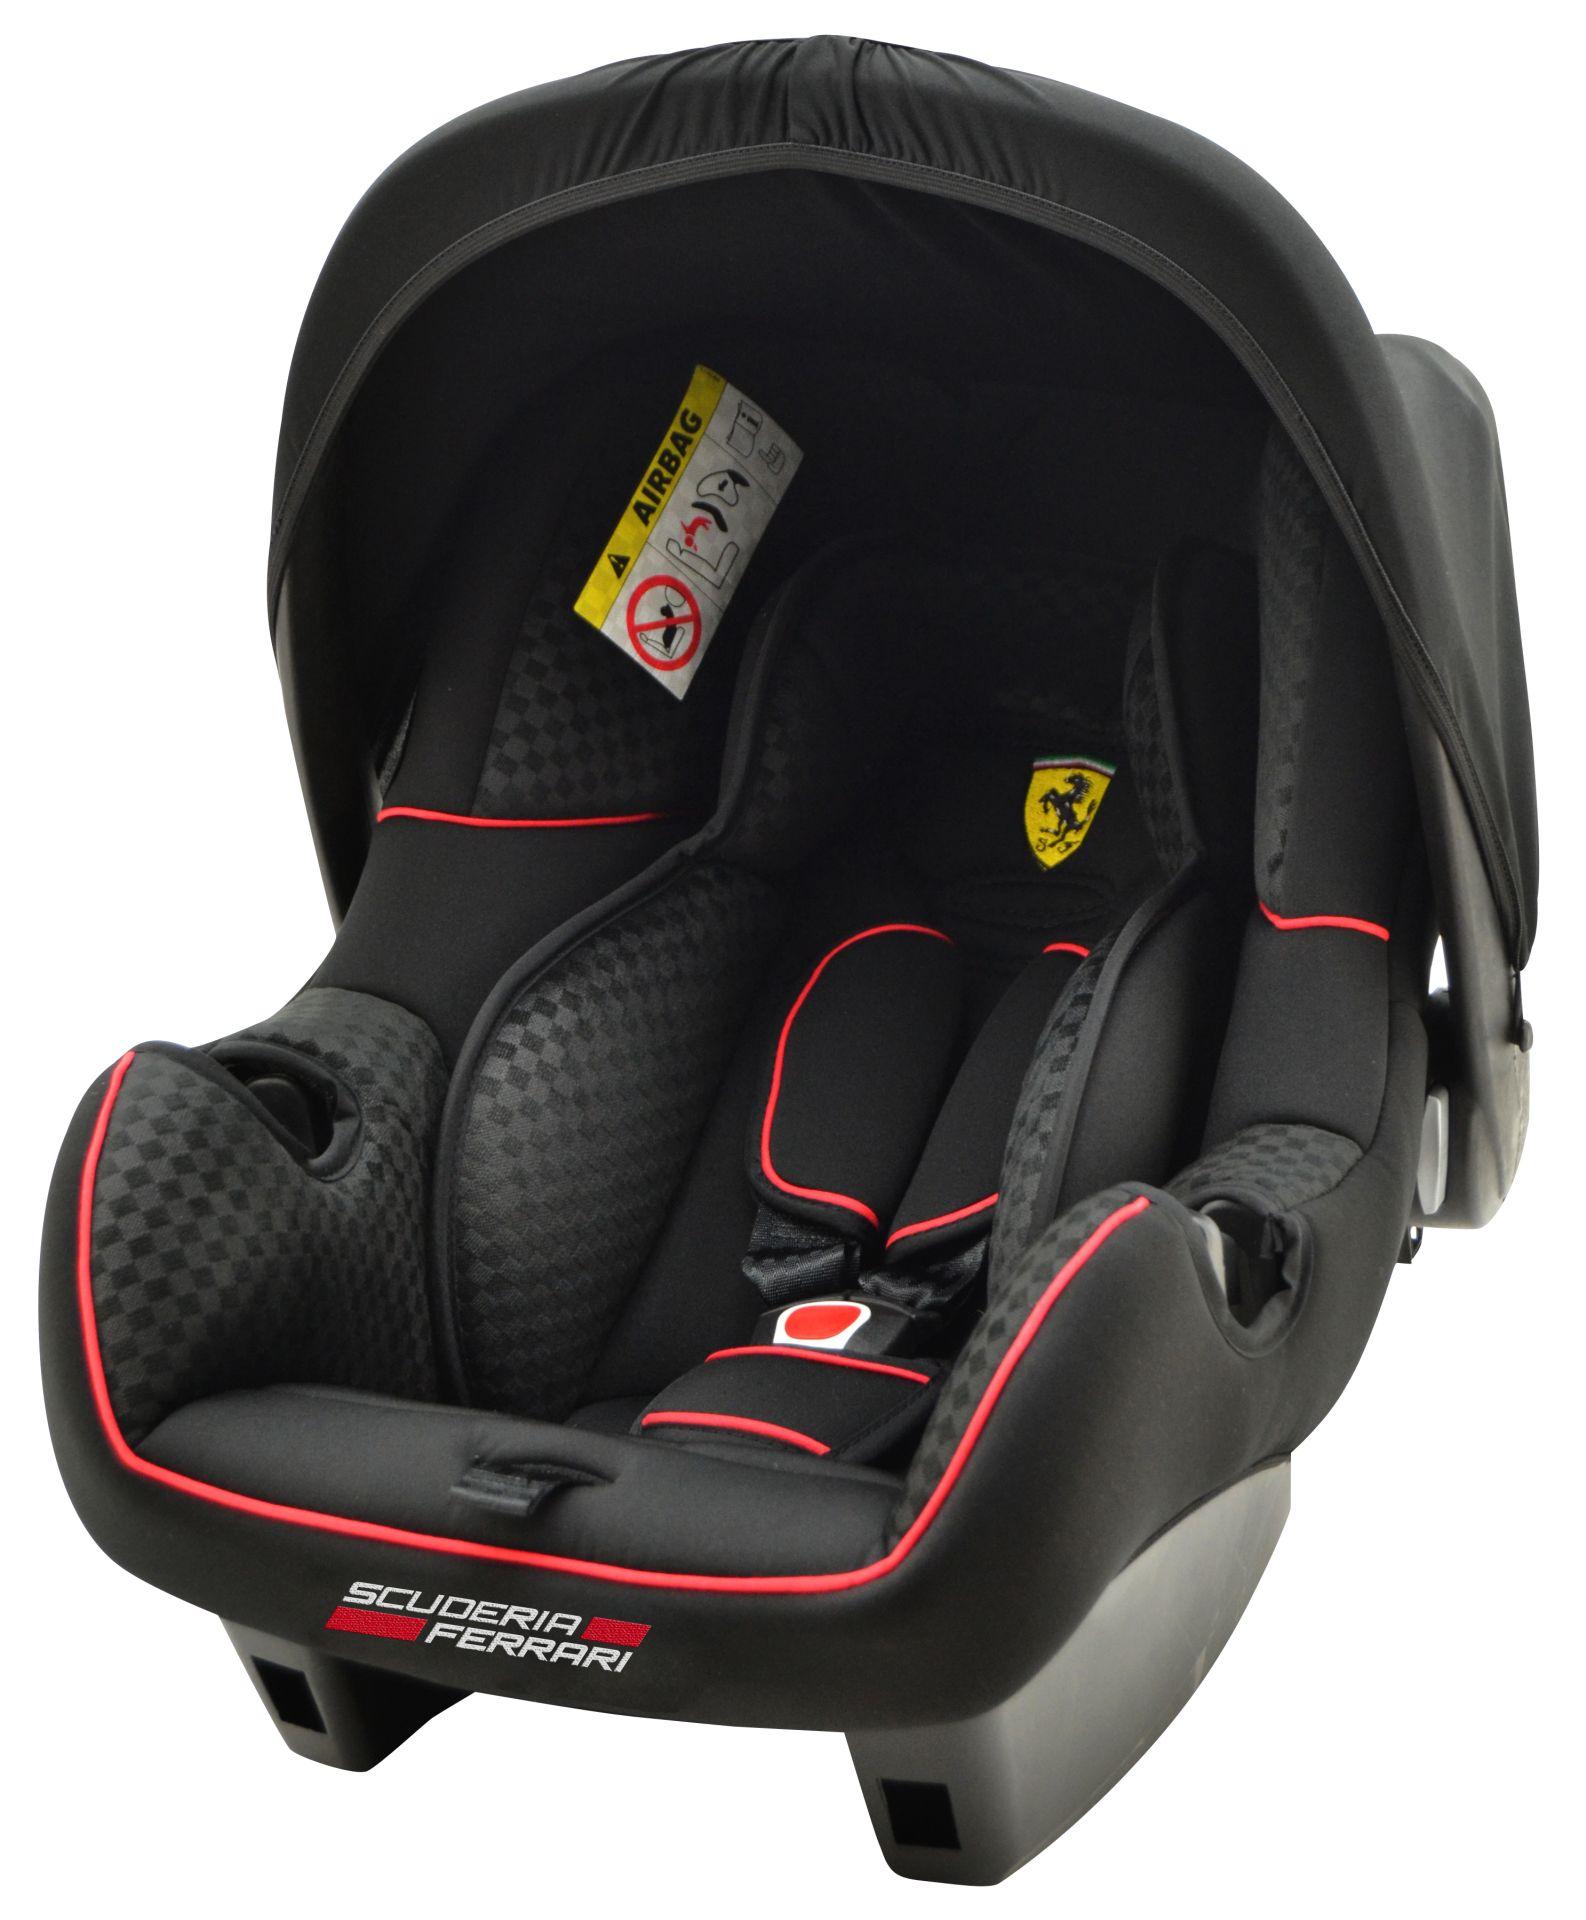 Osann Baby Car Seat Beone Sp Ferrari Kidsroom De